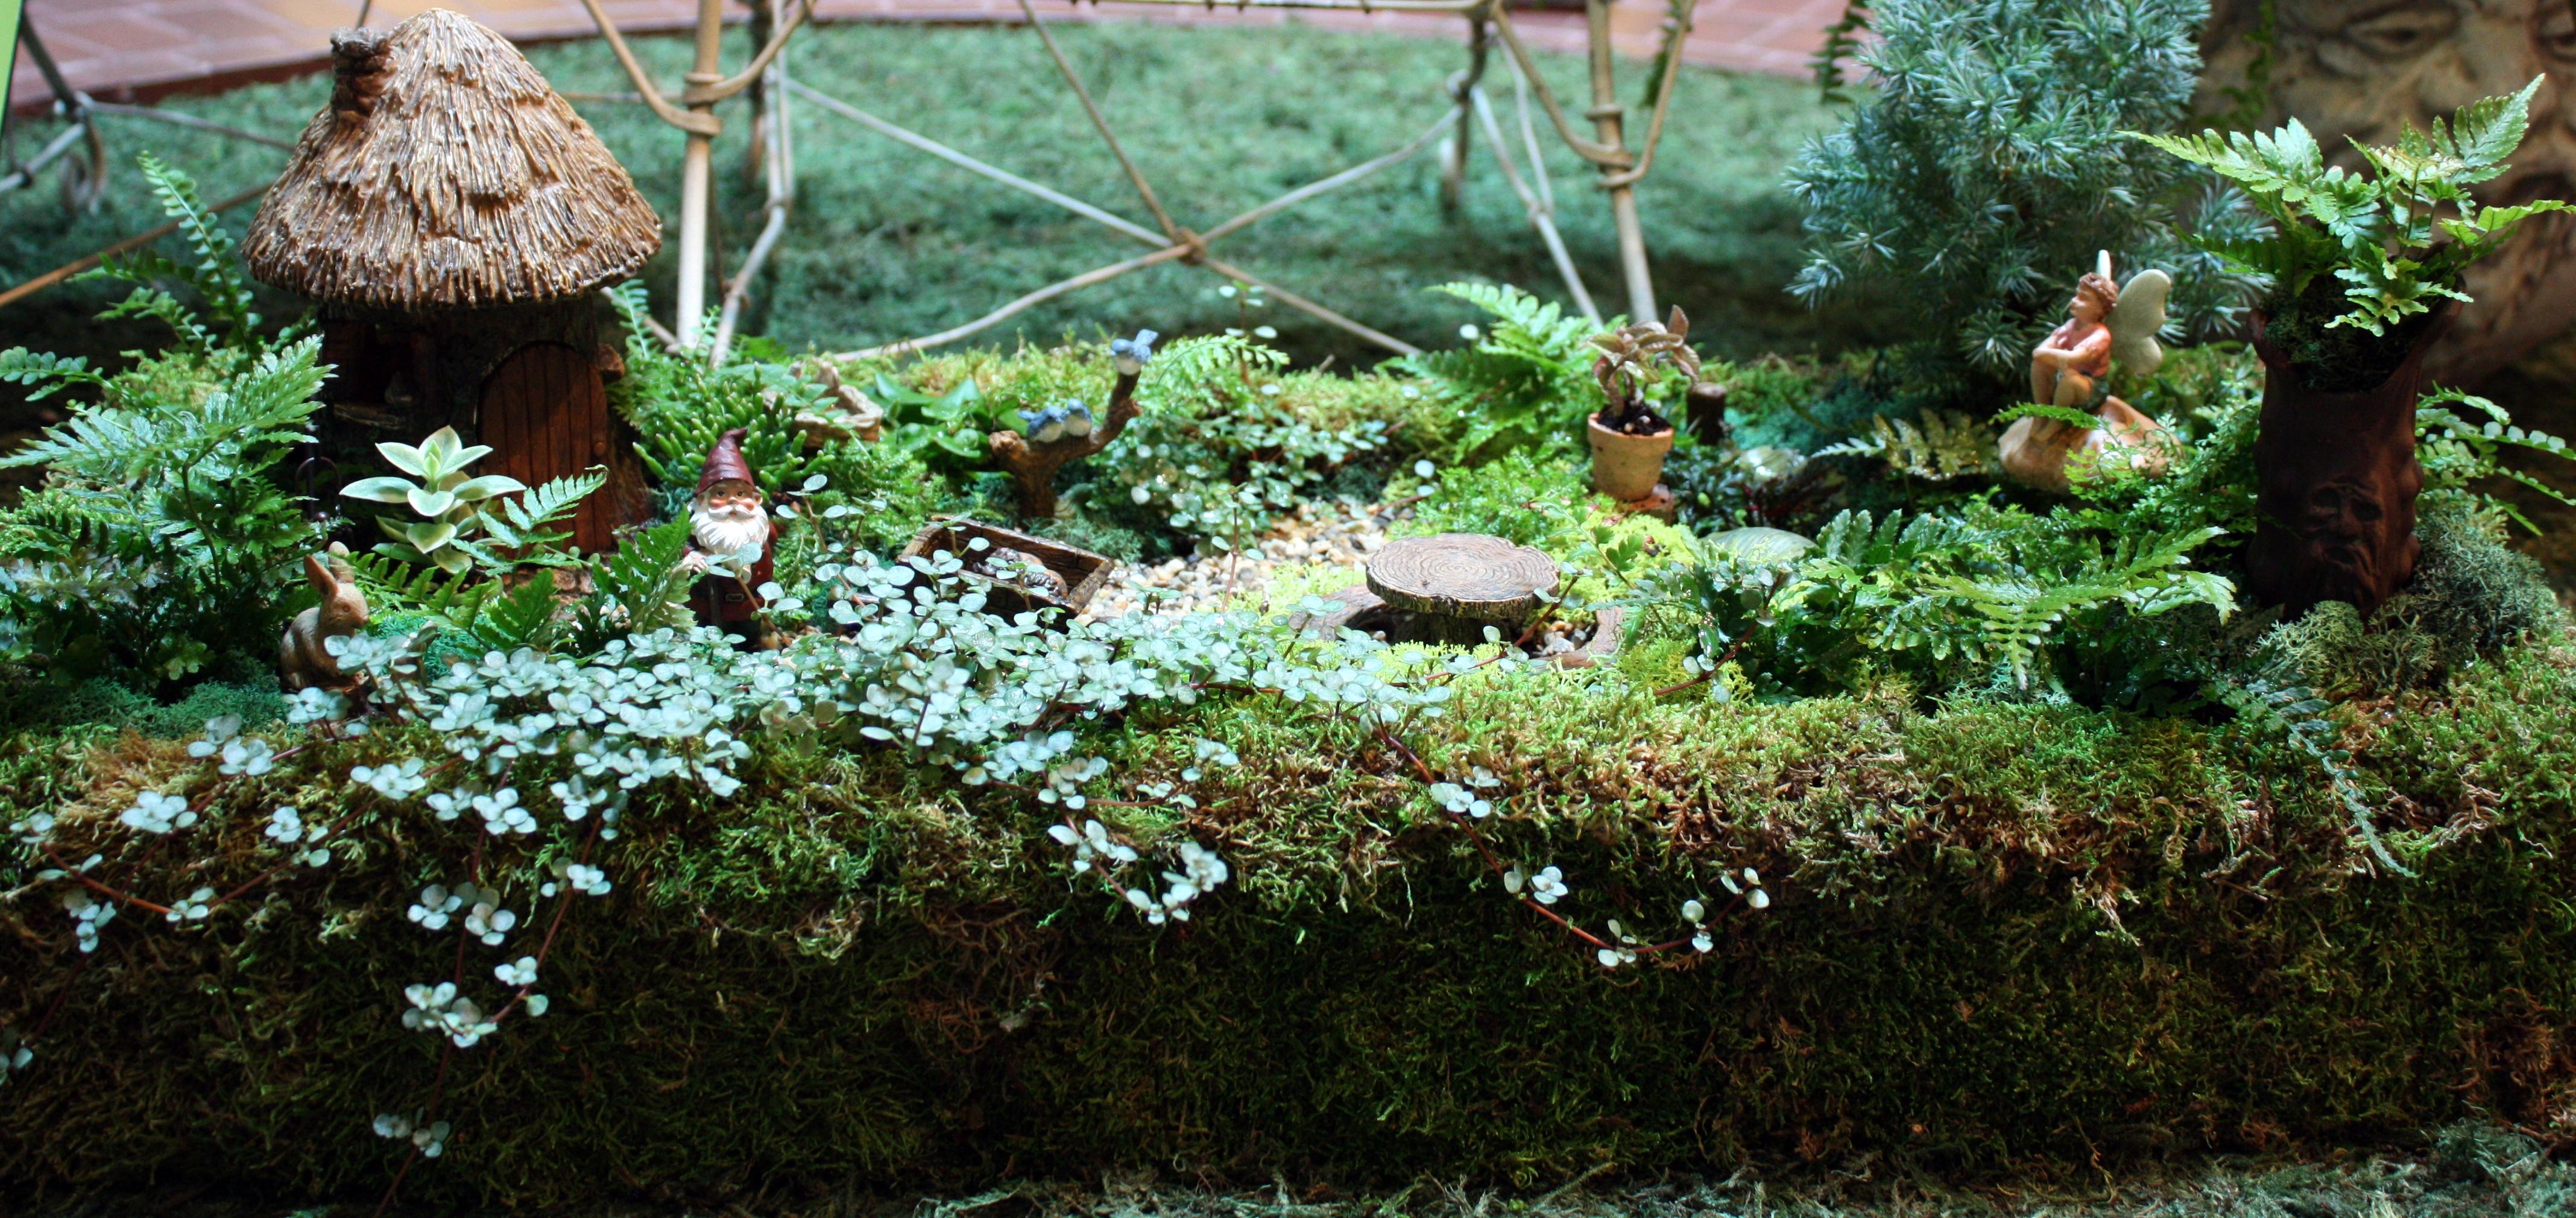 Impressive Fairy Gardens Fairy Garden Container Gardens Smithsonian Gardens Containers garden Containers For Fairy Gardens